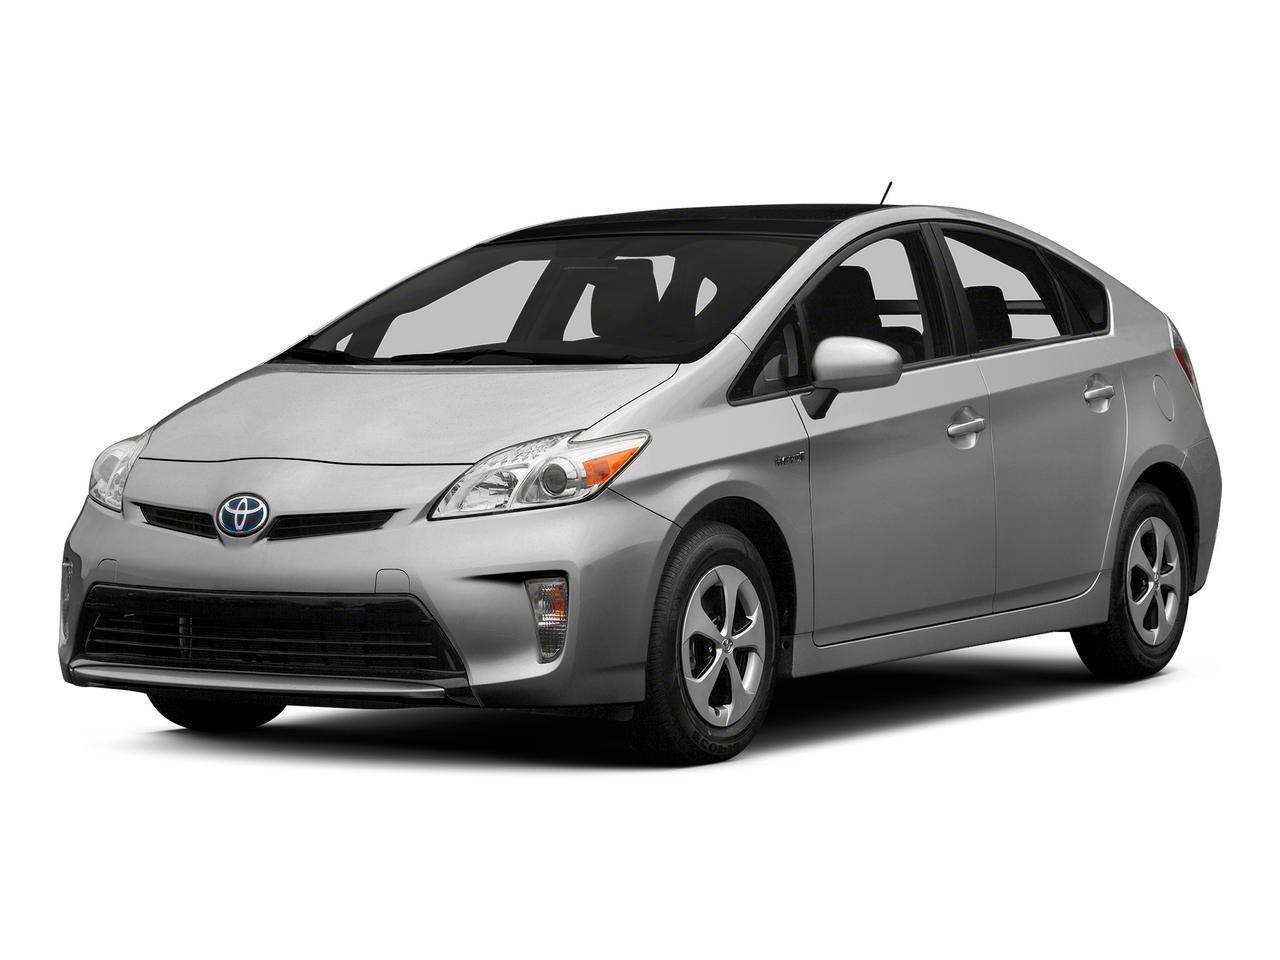 2015 Toyota Prius Vehicle Photo in Colma, CA 94014